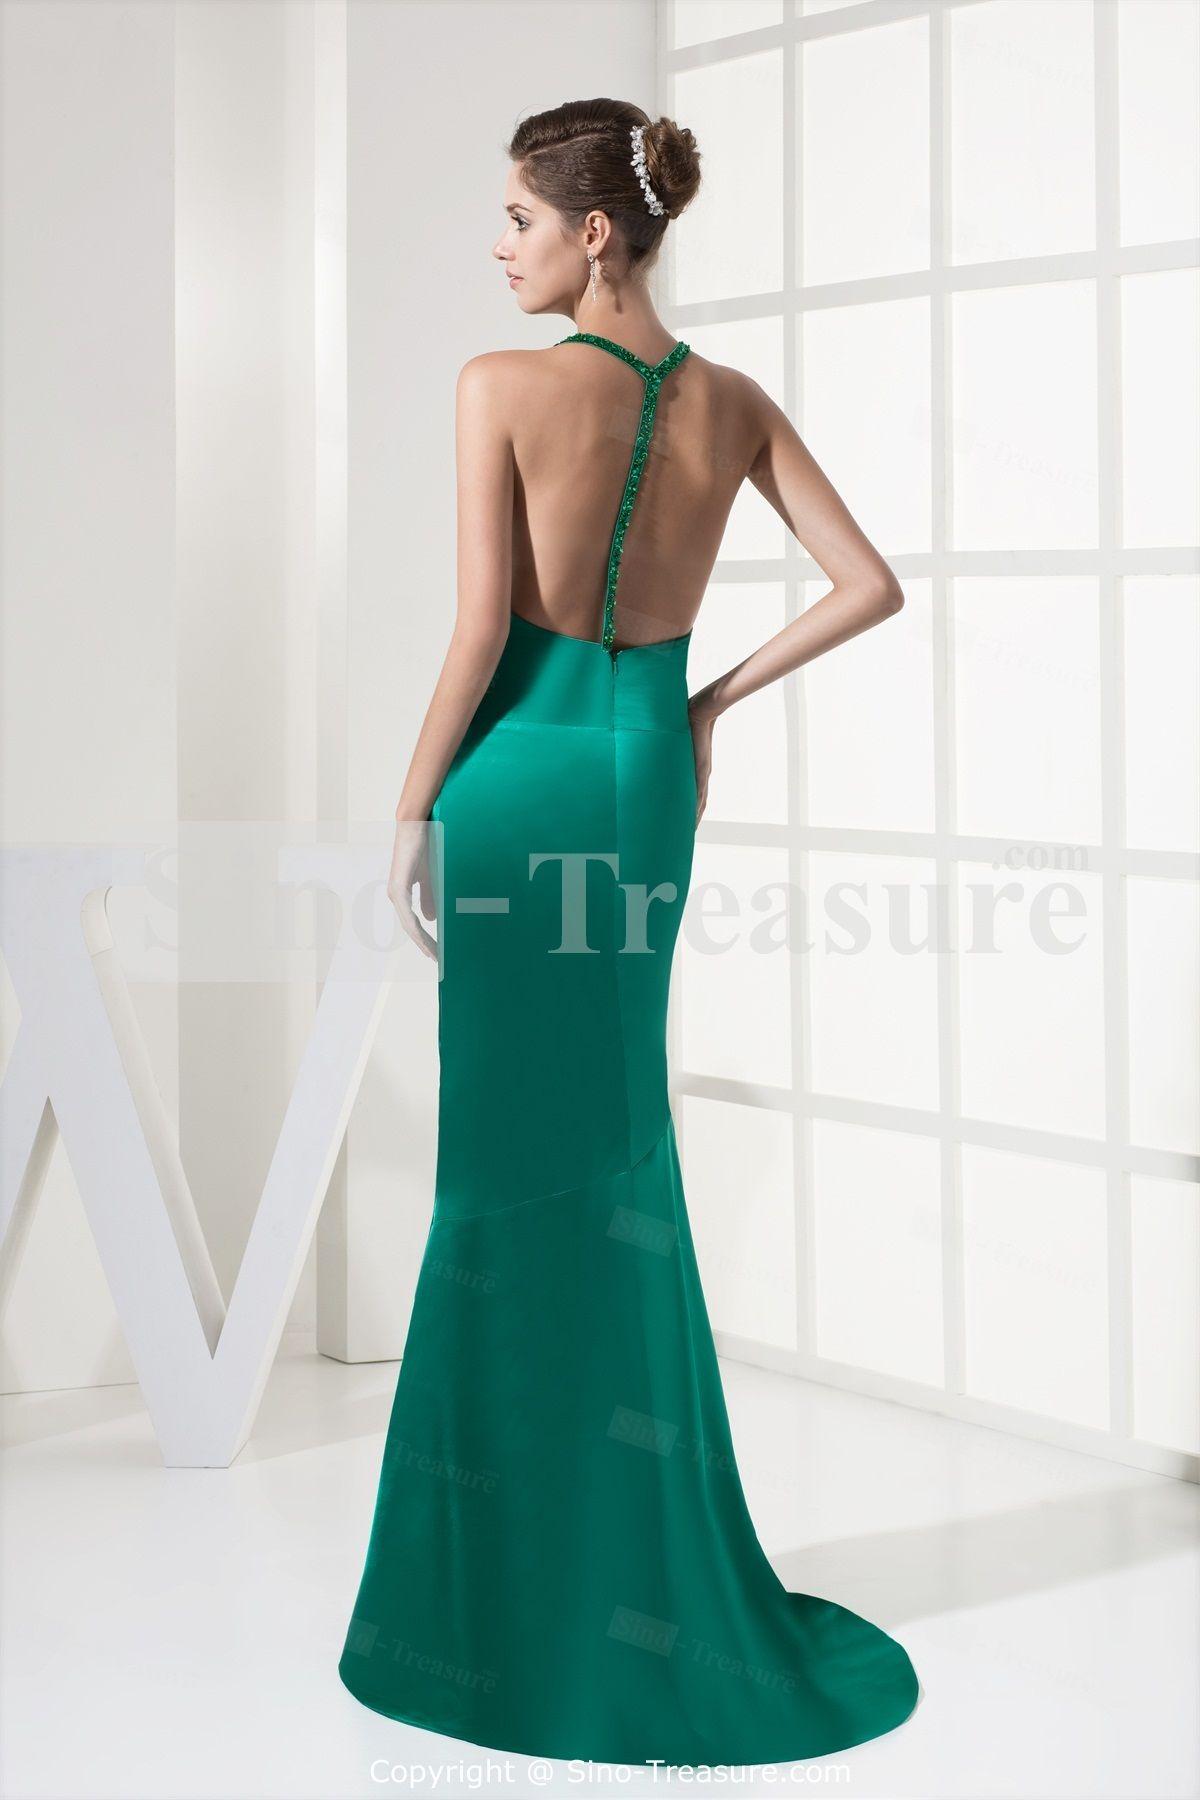 Bright hunter green brush train elastic woven satin evening dress